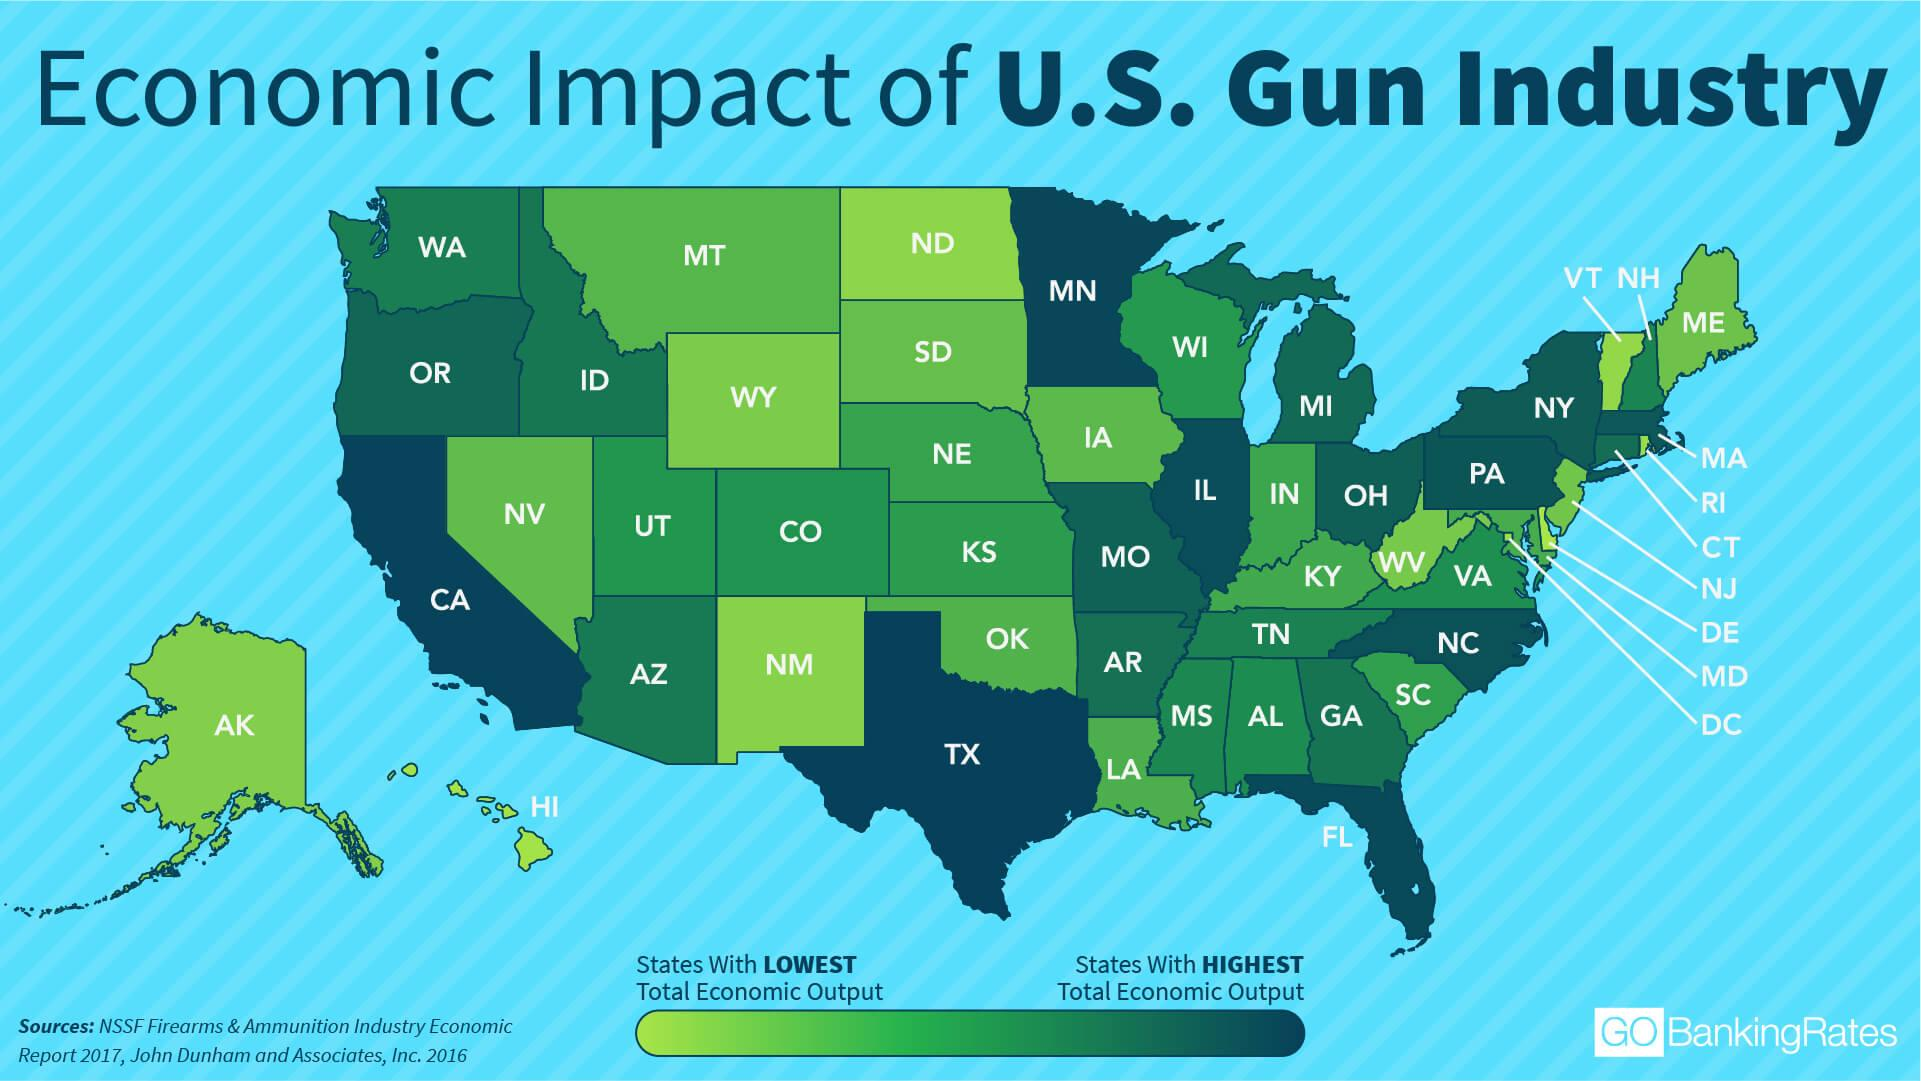 Economic Impact of the U.S. Gun Industry